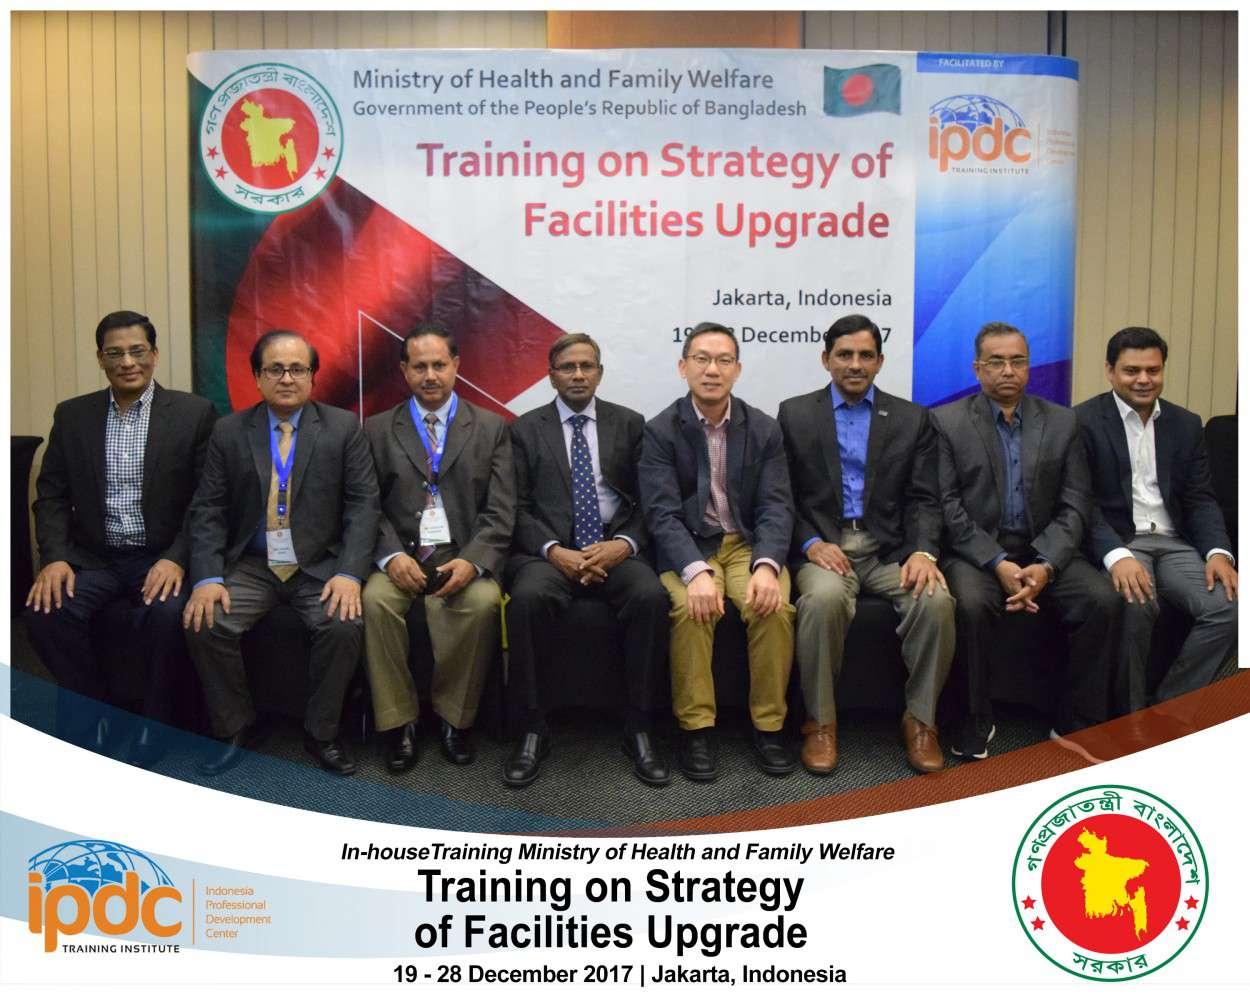 IPDC Training